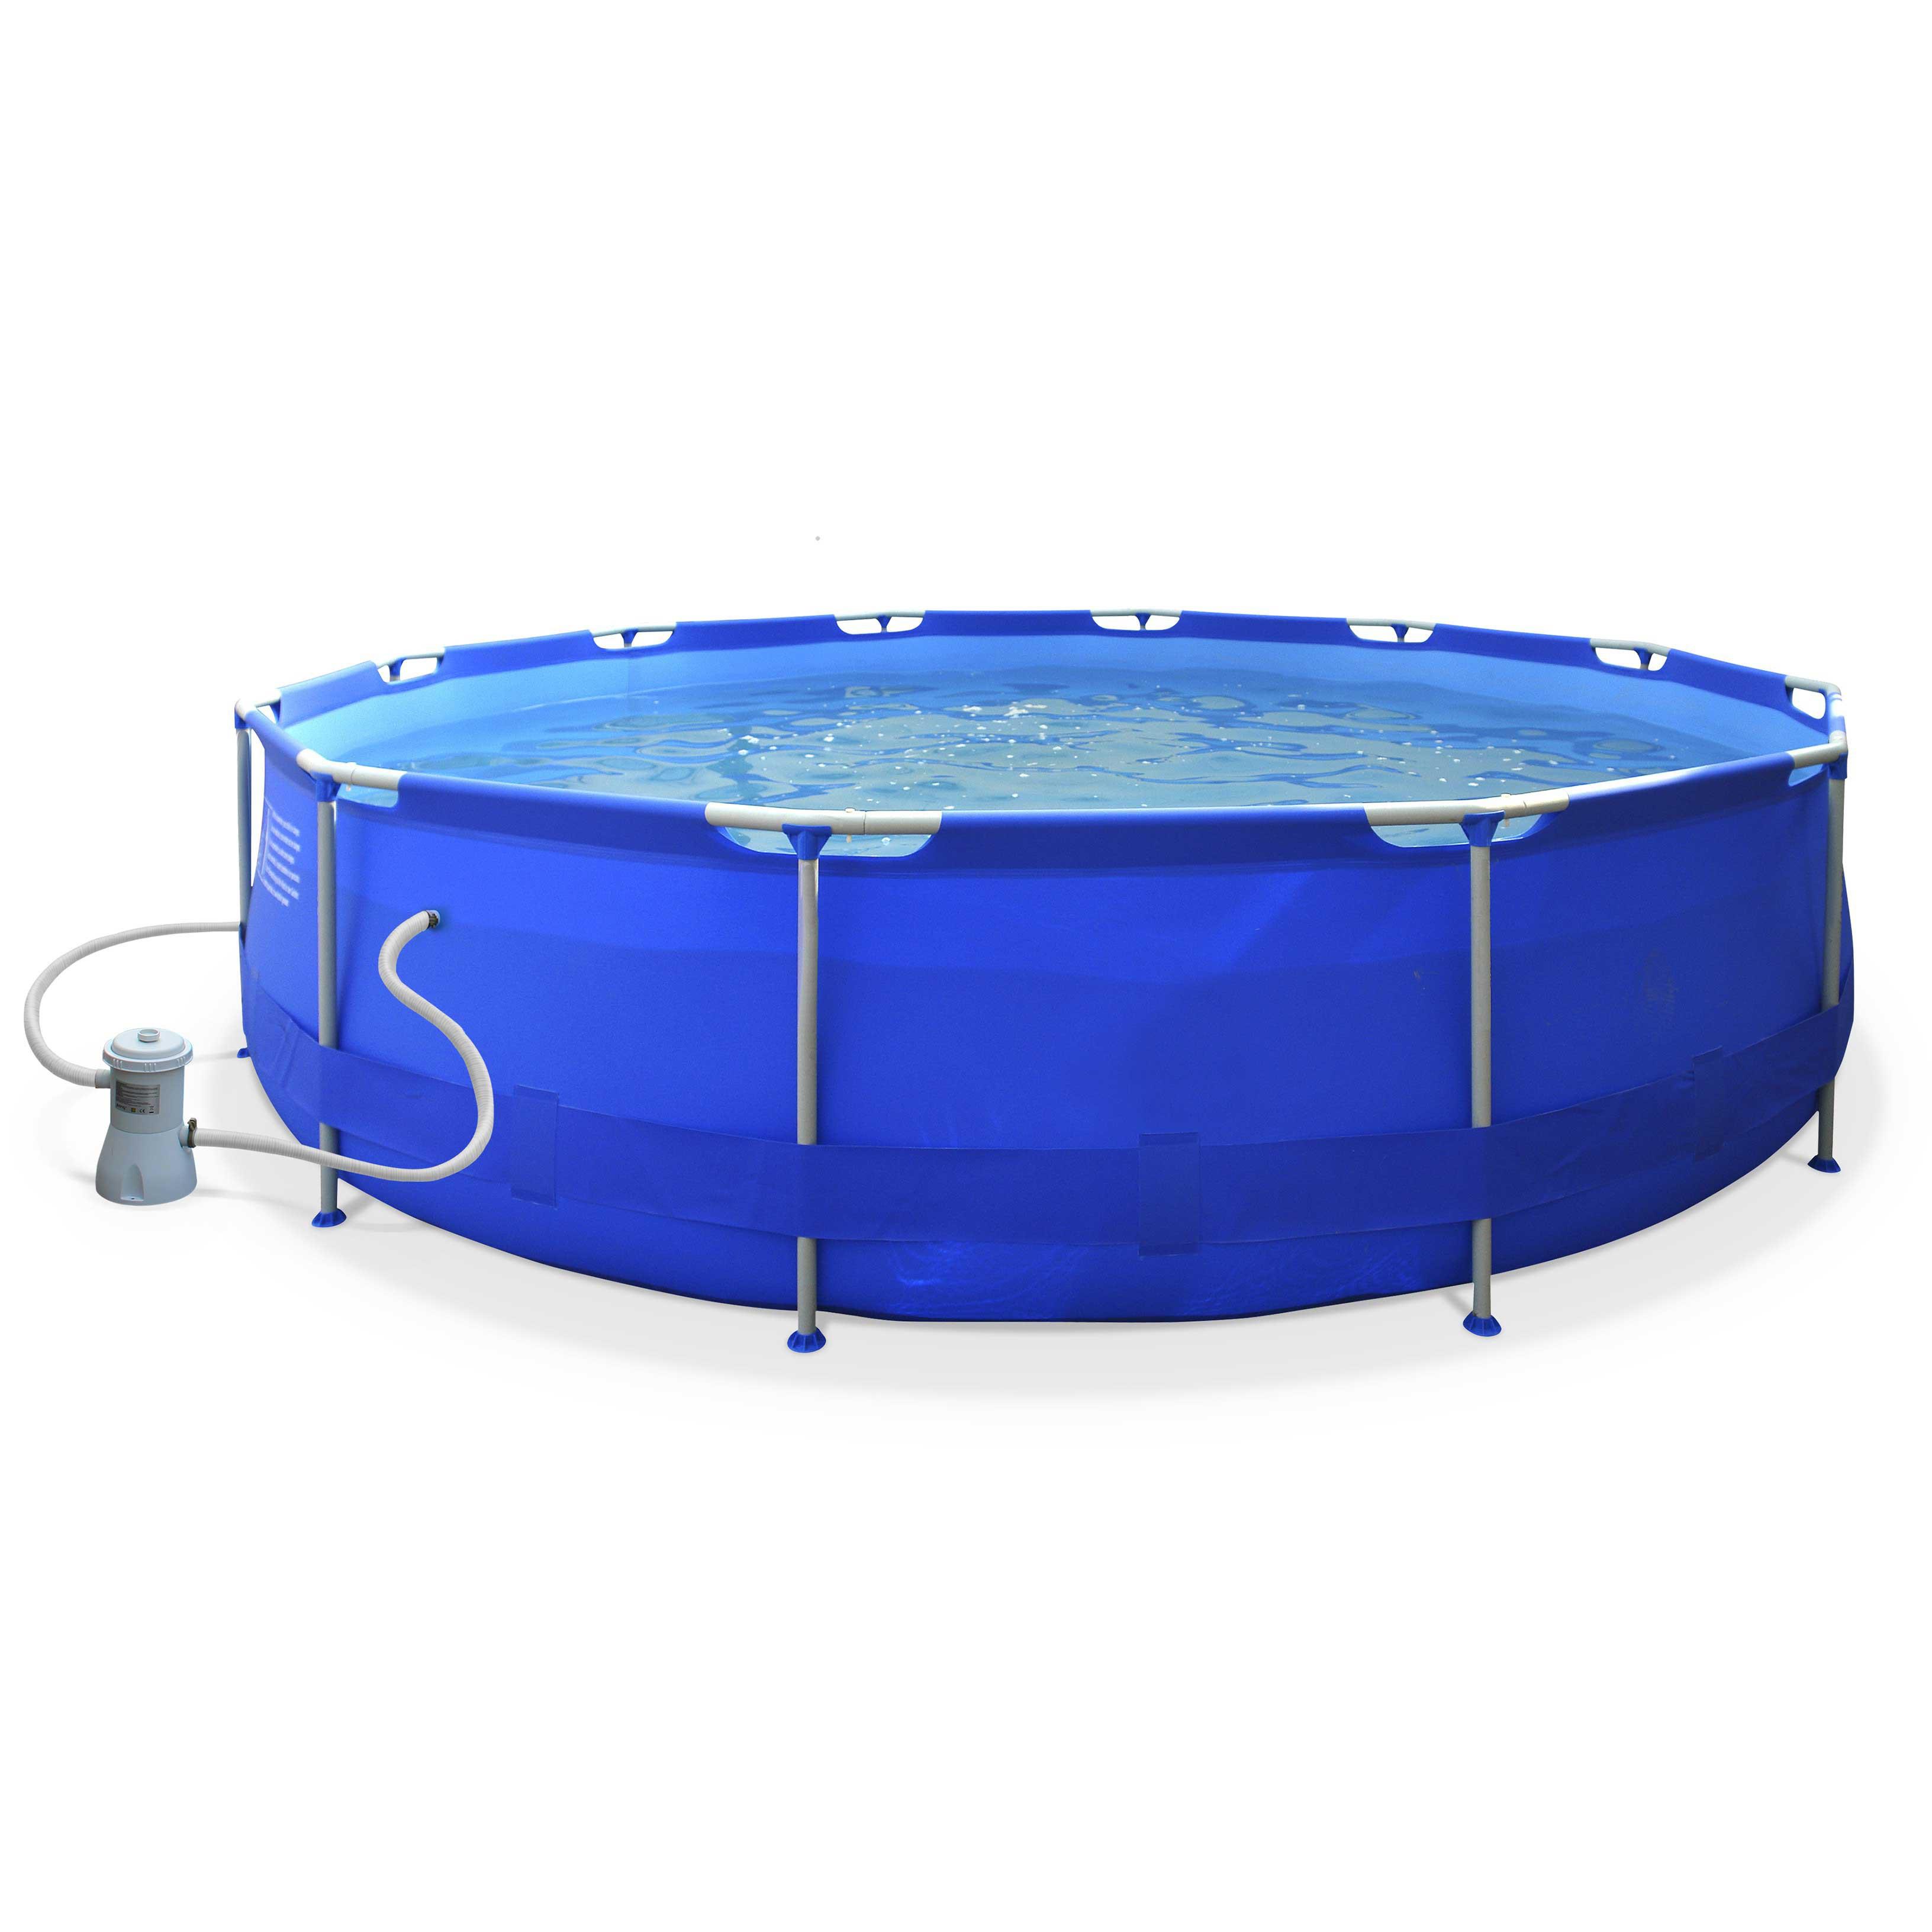 filtration piscine tubulaire